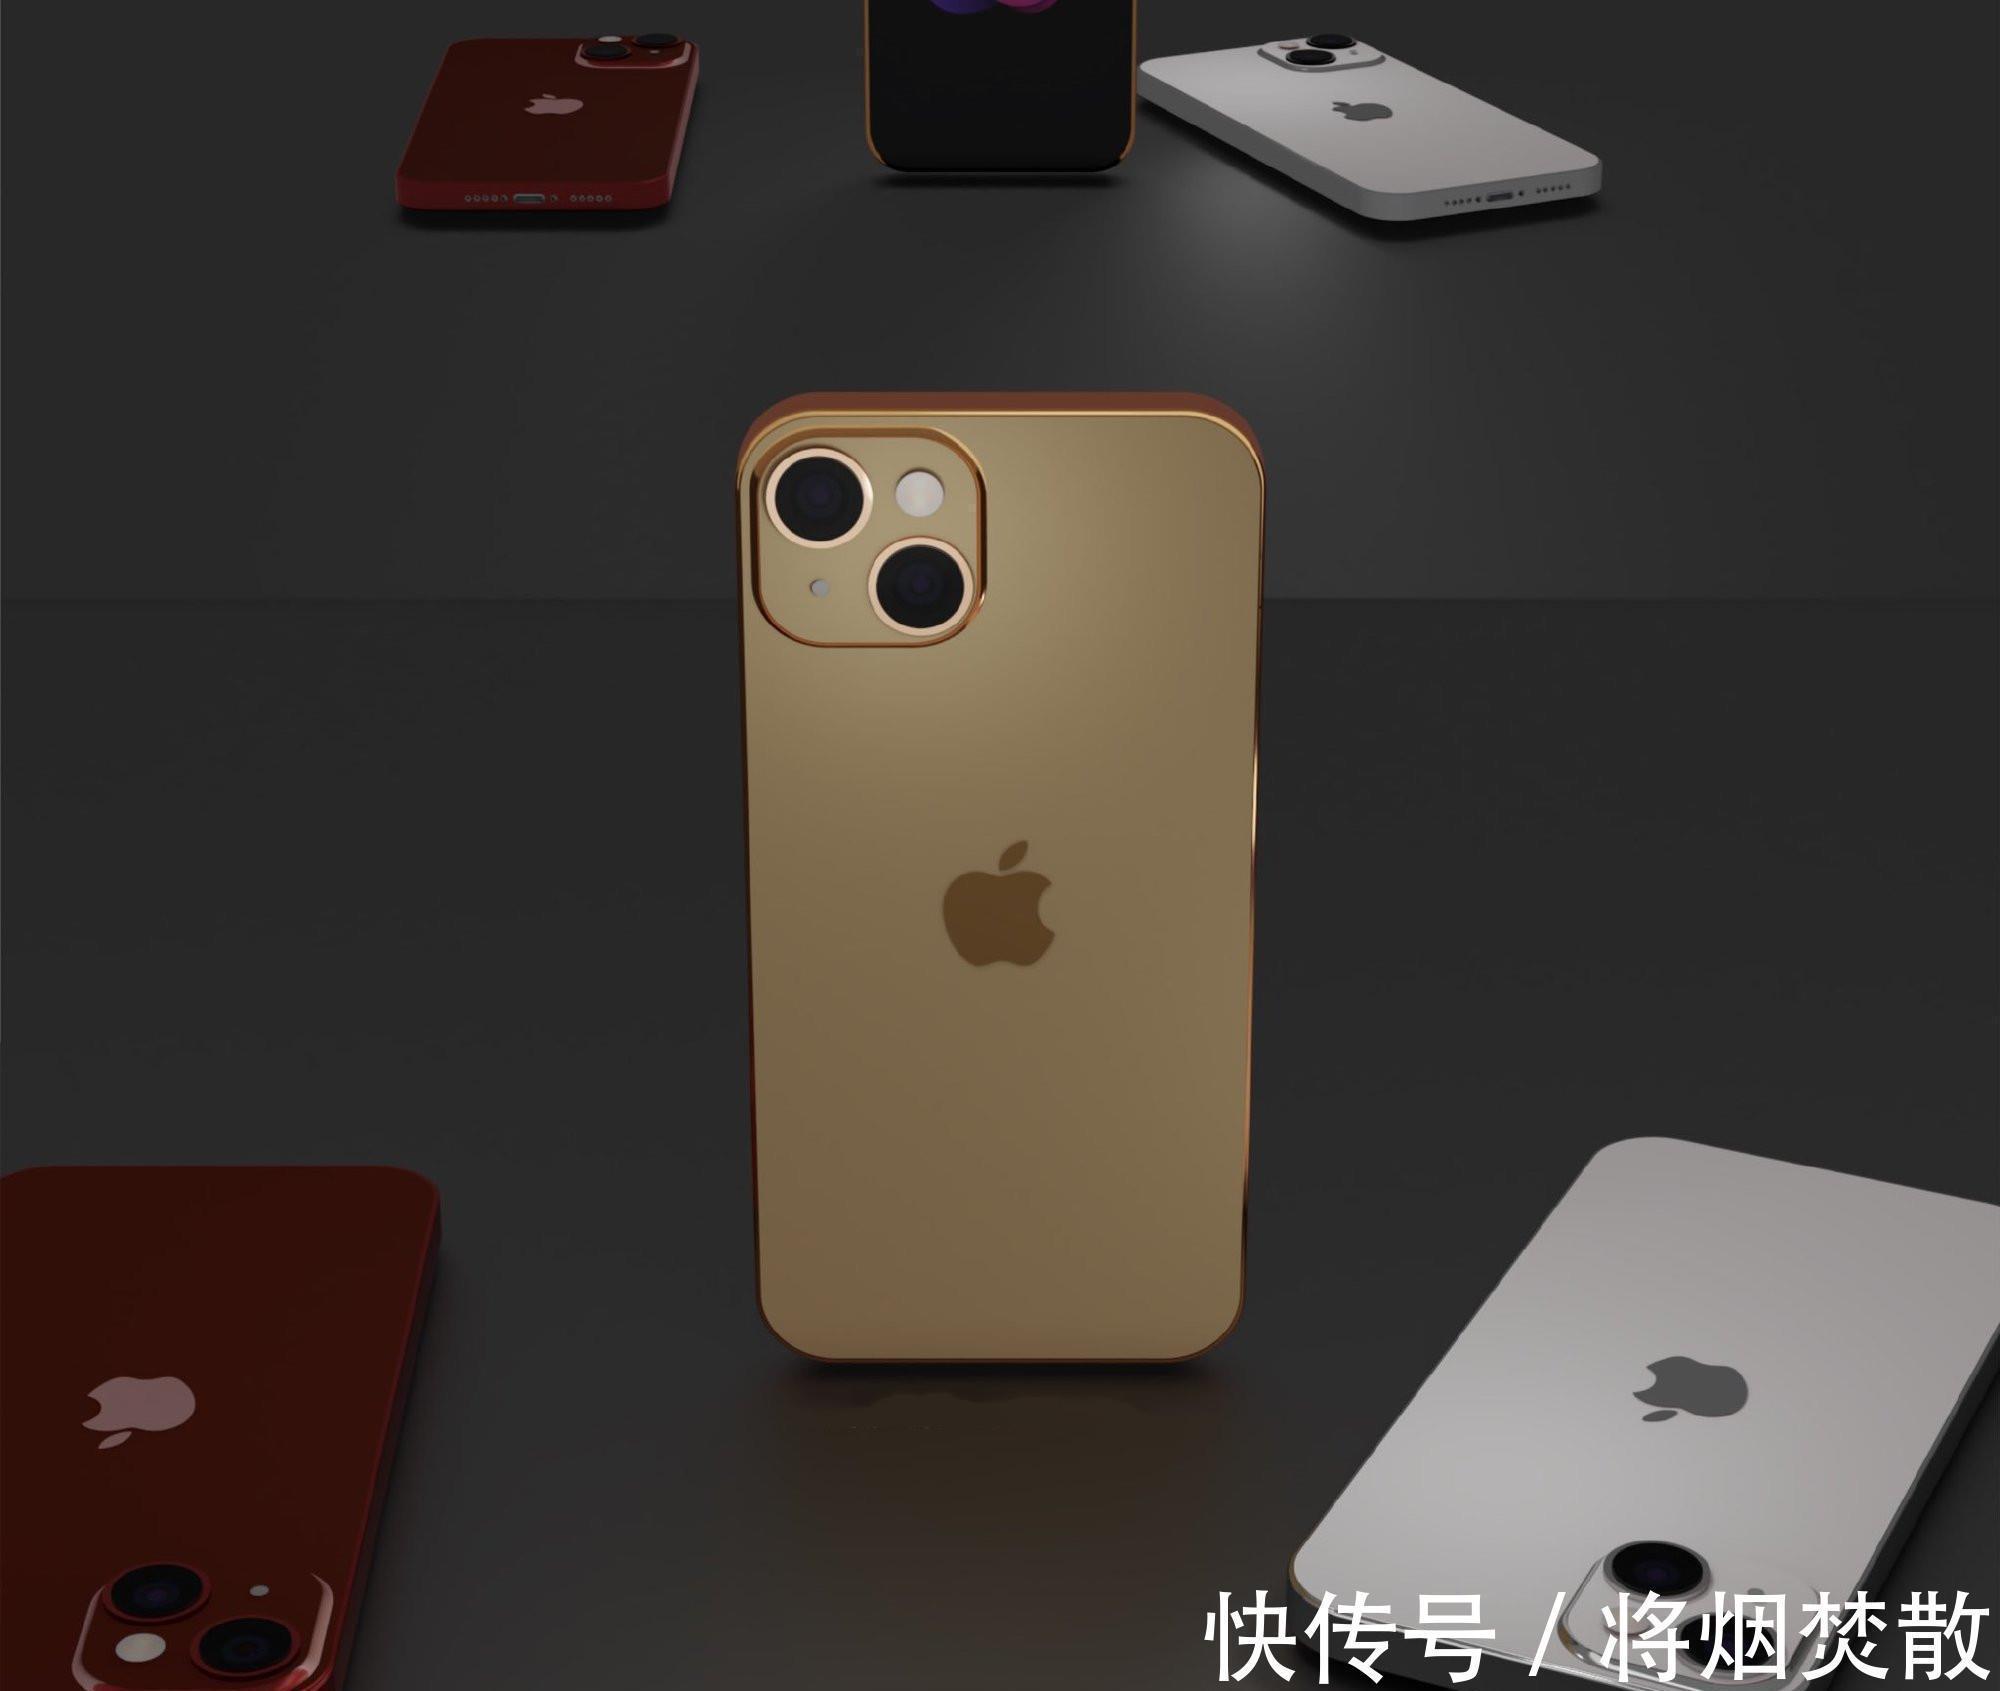 iphone12|iPhone13定于9月14日发布,新增两个配色,四款机型,价格要涨